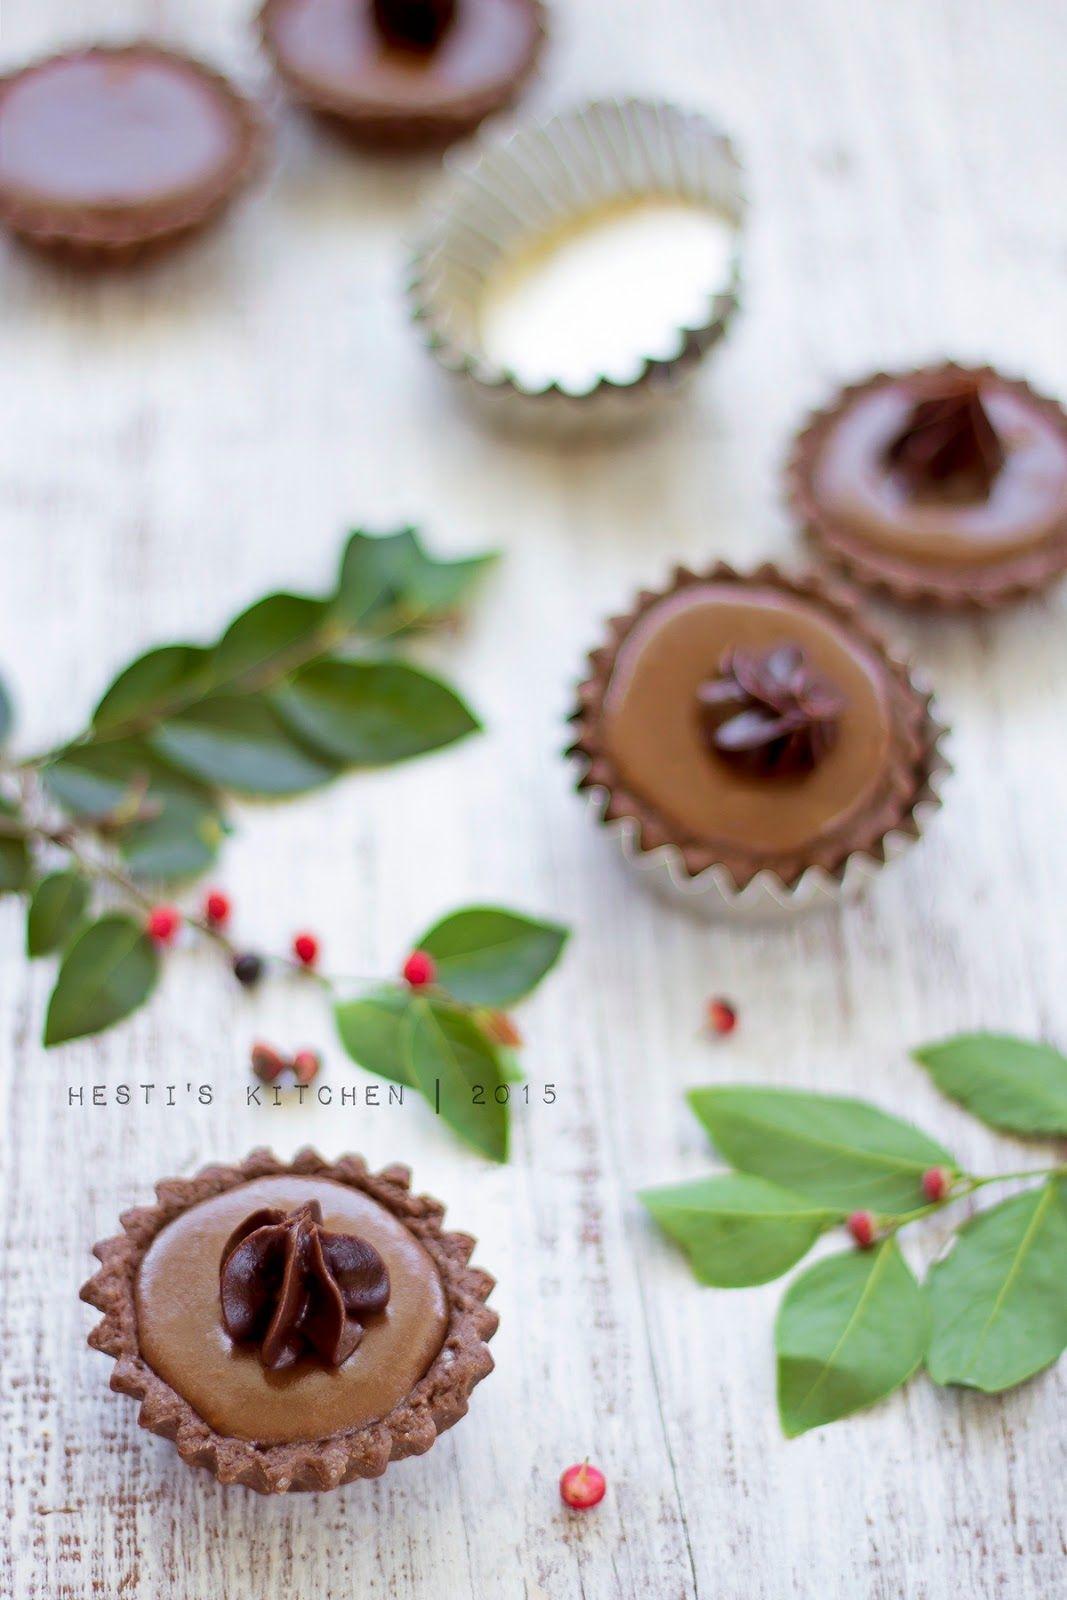 Hesti S Kitchen Yummy For Your Tummy Chocolate Cheese Tart Egg Tart Kue Kering Mentega Keping Coklat